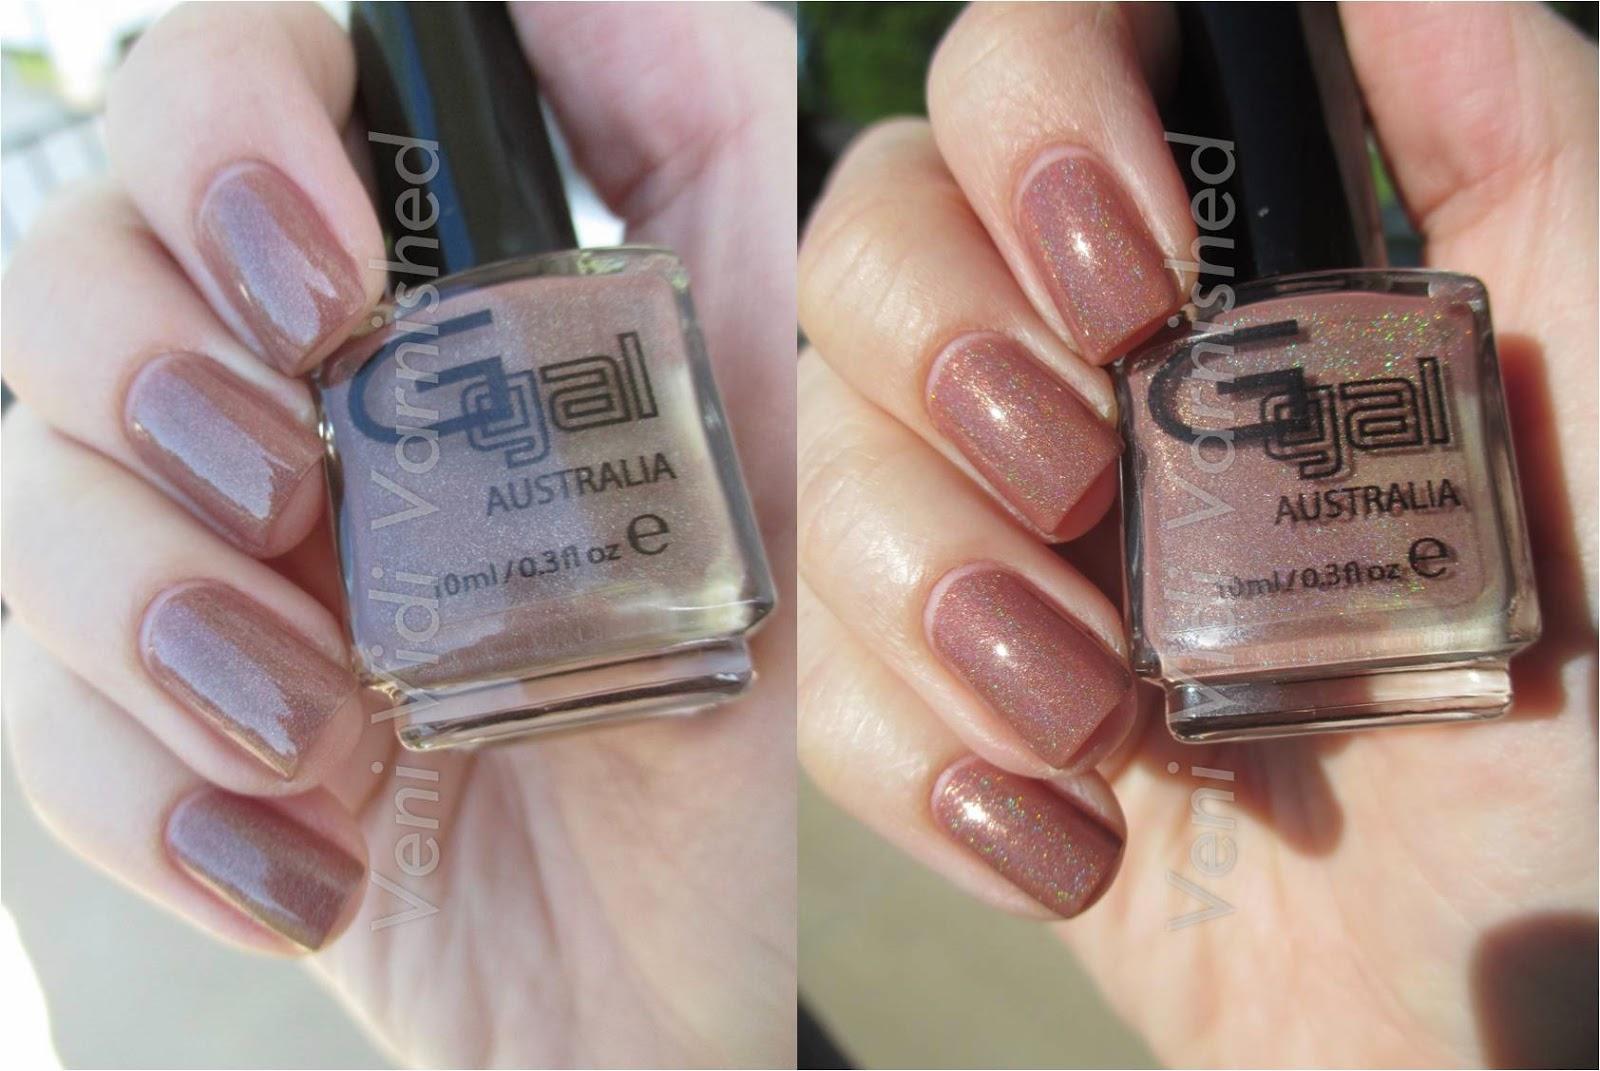 Glitter Gal Australia Suede Holographic Nail Polish